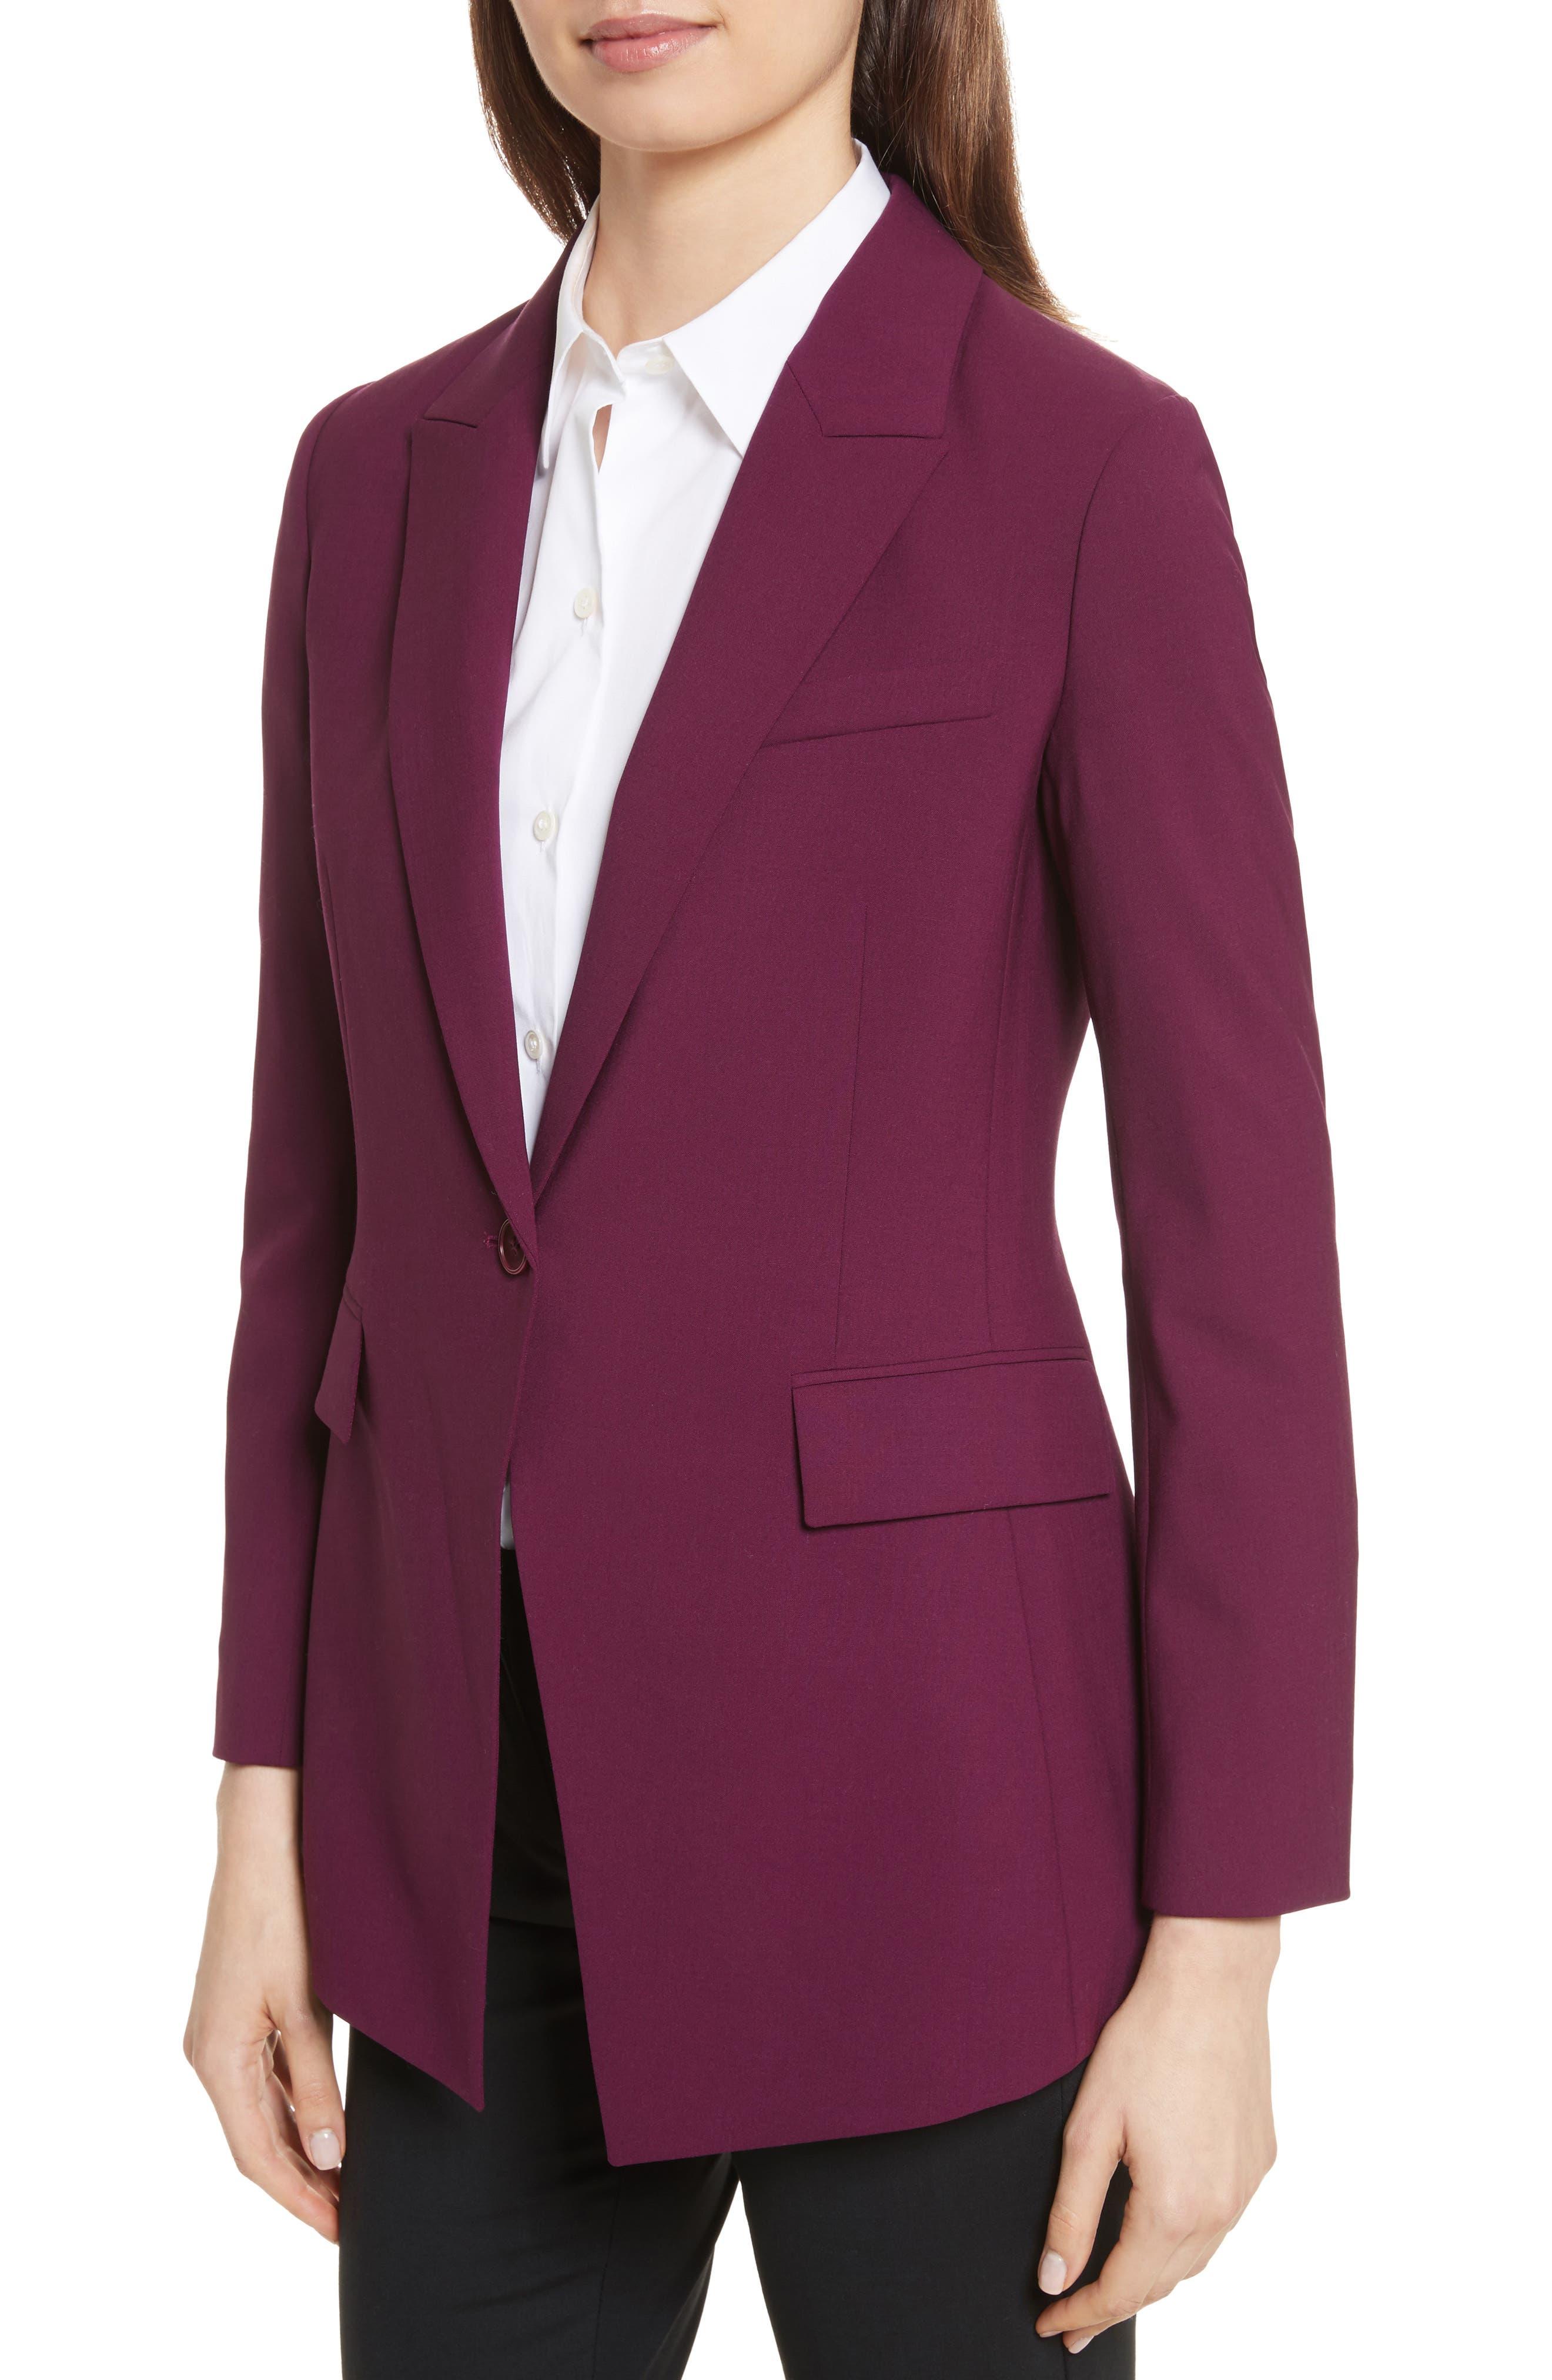 Etienette B Good Wool Suit Jacket,                             Alternate thumbnail 29, color,